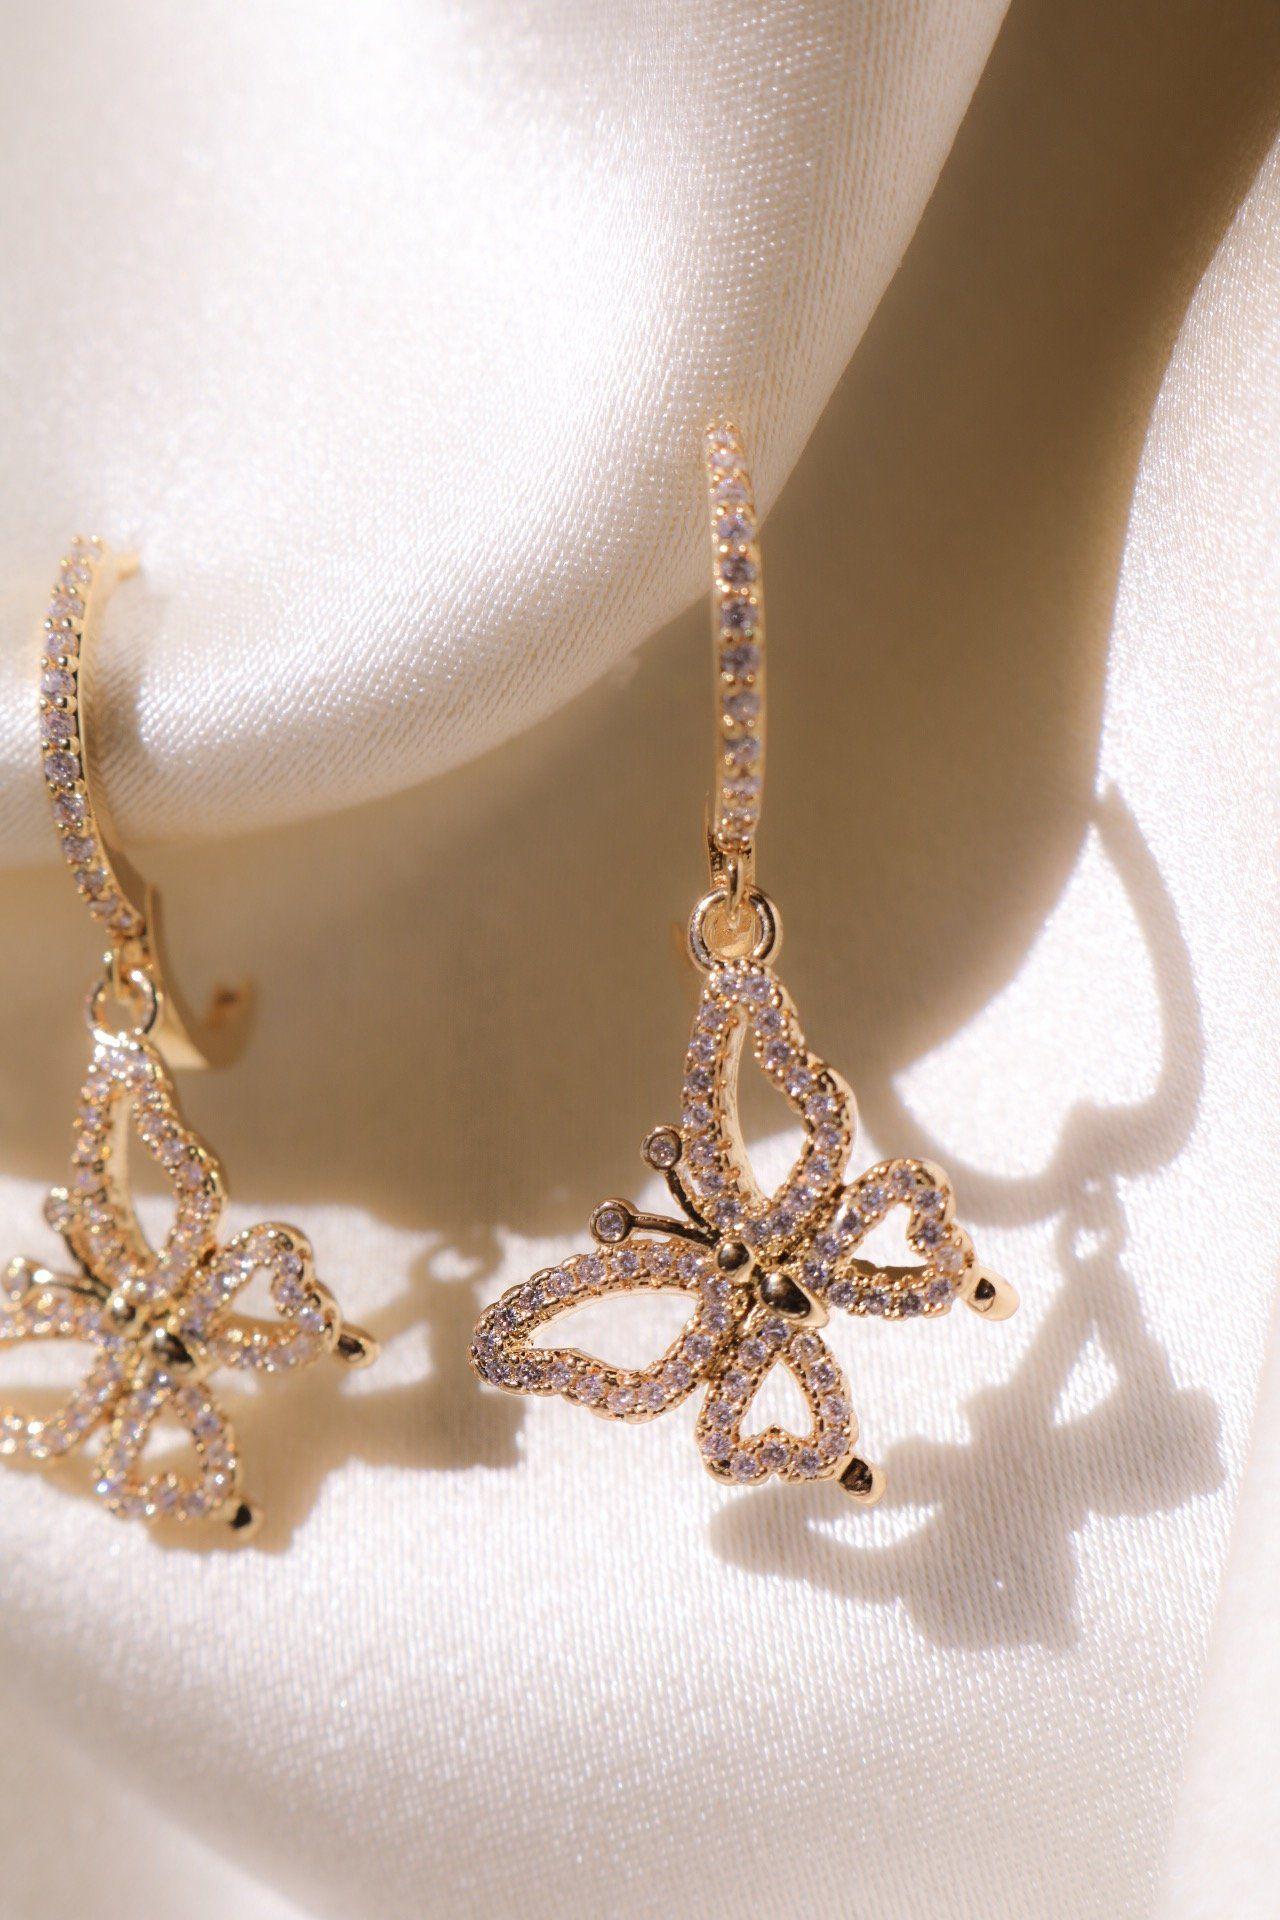 Silver 5.5mm Round Wedding Jewelry Fine Earrings Semi Mount Setting Jewelry Gift